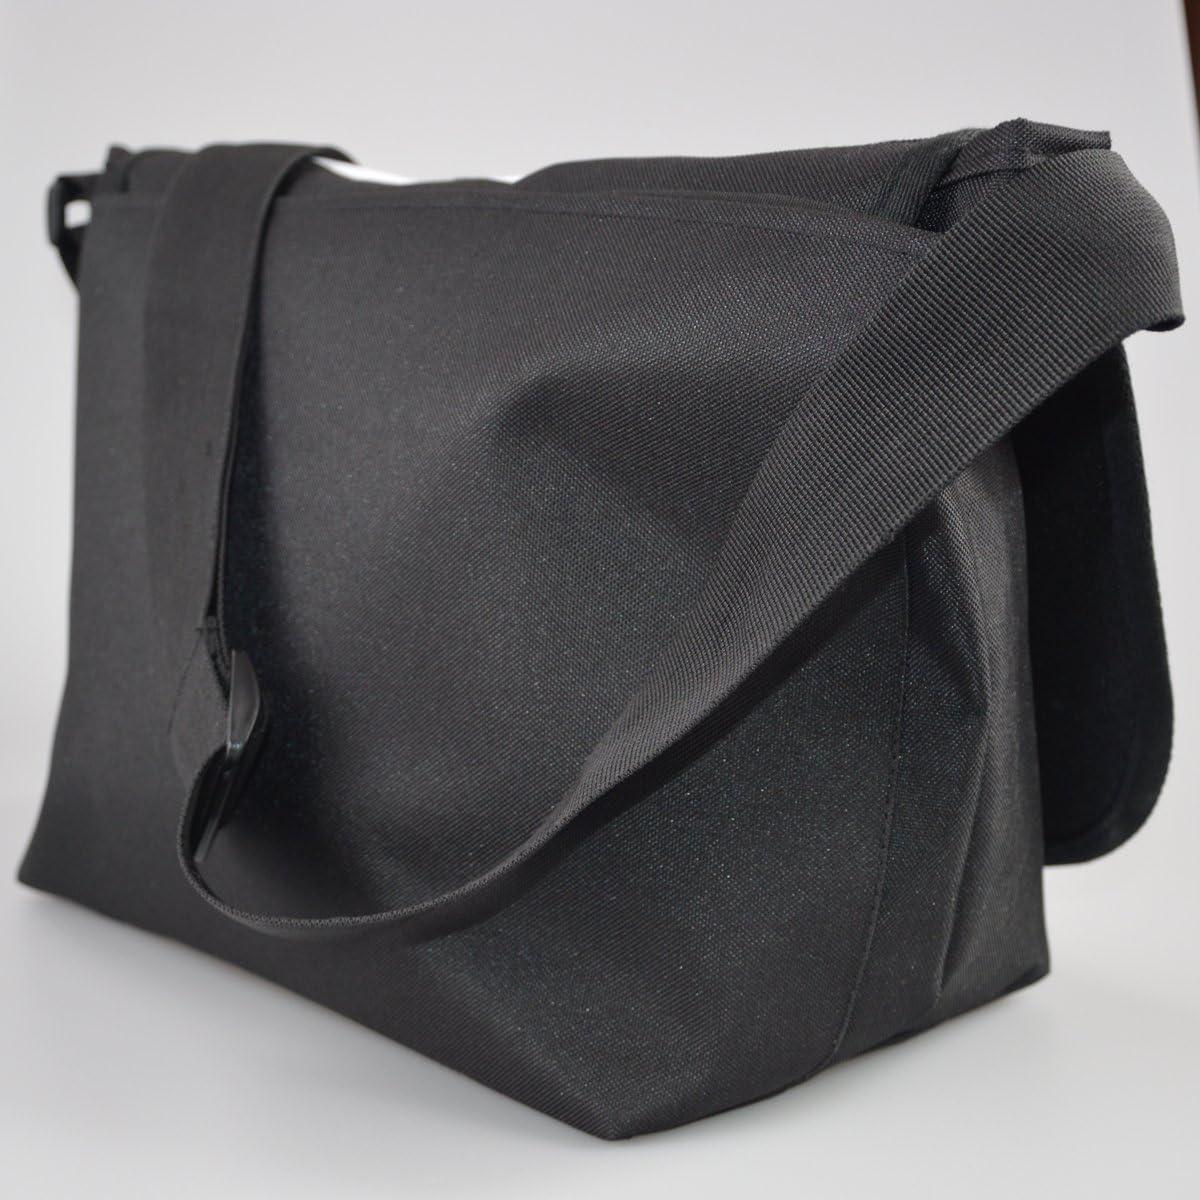 Pink And Green Handbag Crossbody Bags For Women Sling Shoulder Messenger